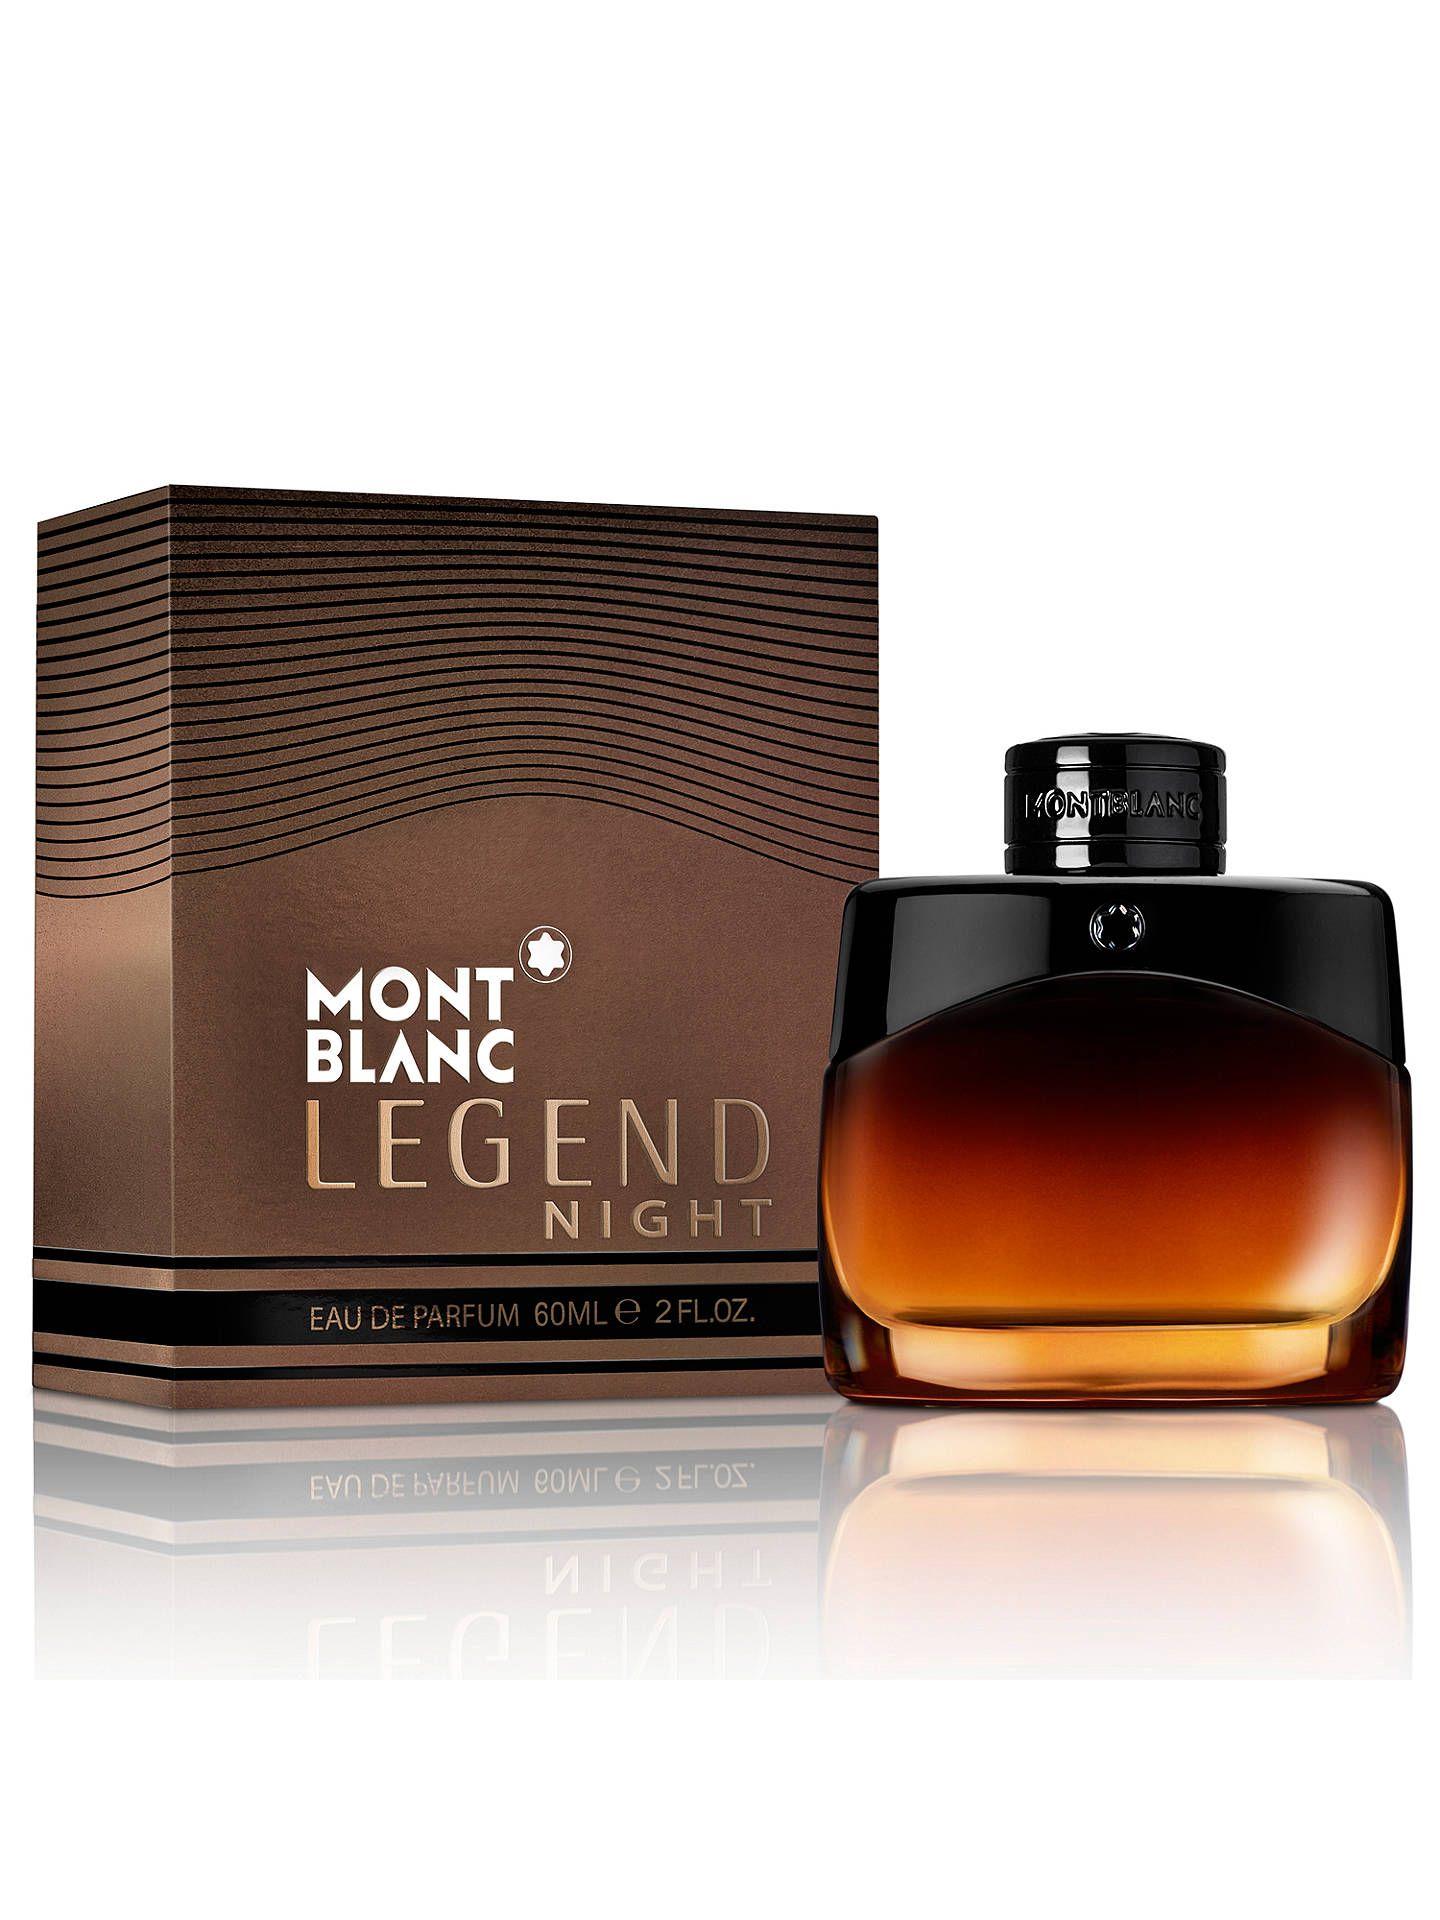 Mont Blanc Legend Night Eau de Parfum 100ml - £33.95 on eBay from Perfume Shop Direct